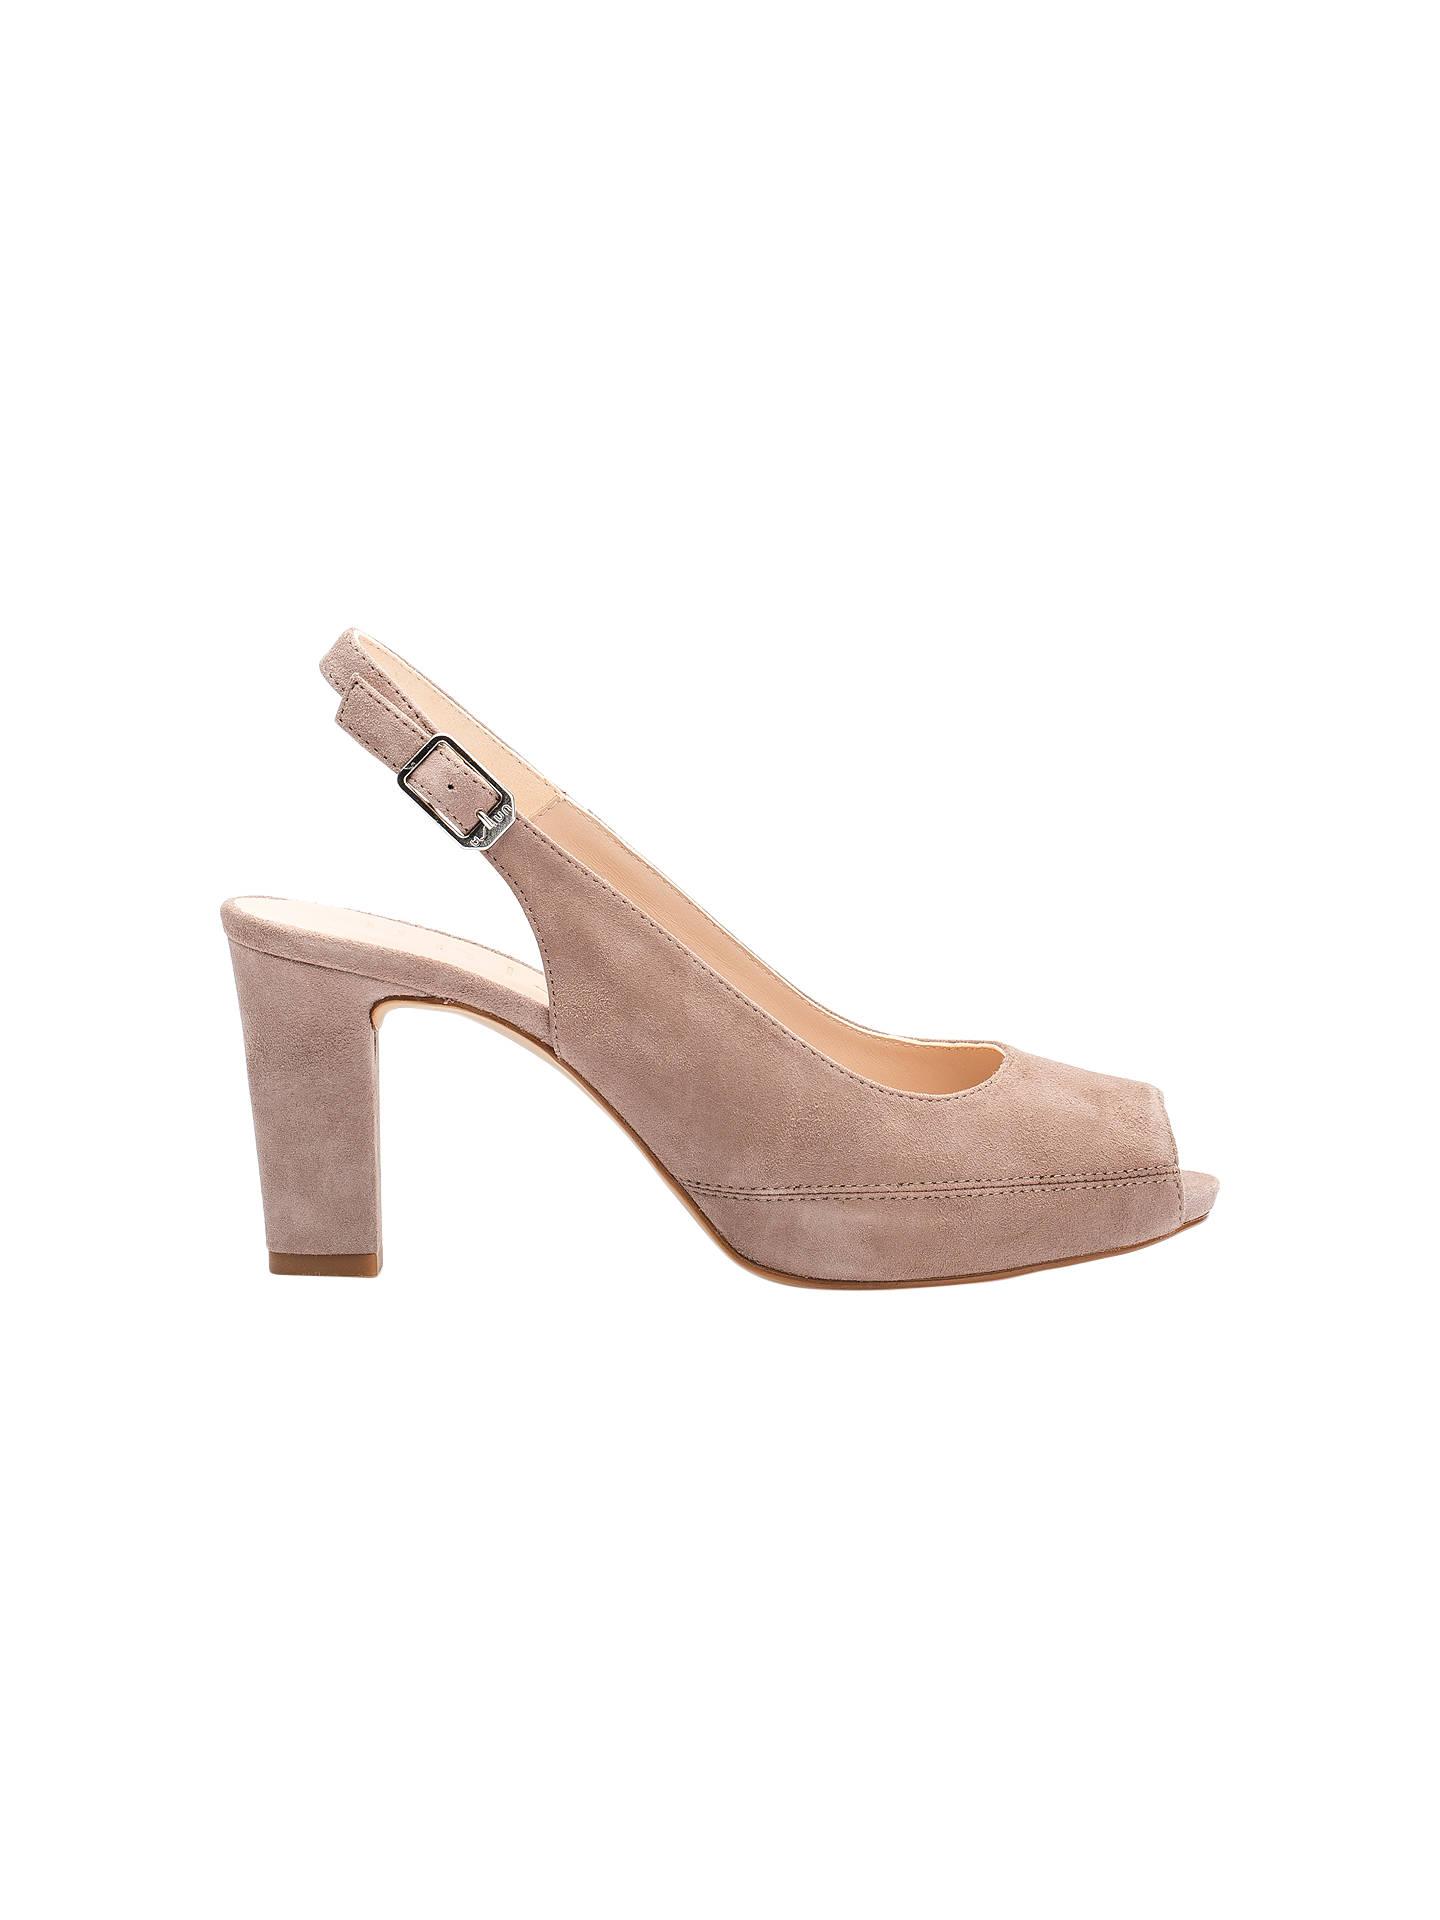 3747b092eaa2 Unisa Nick Classic Peep Toe Block Heeled Sandals at John Lewis ...